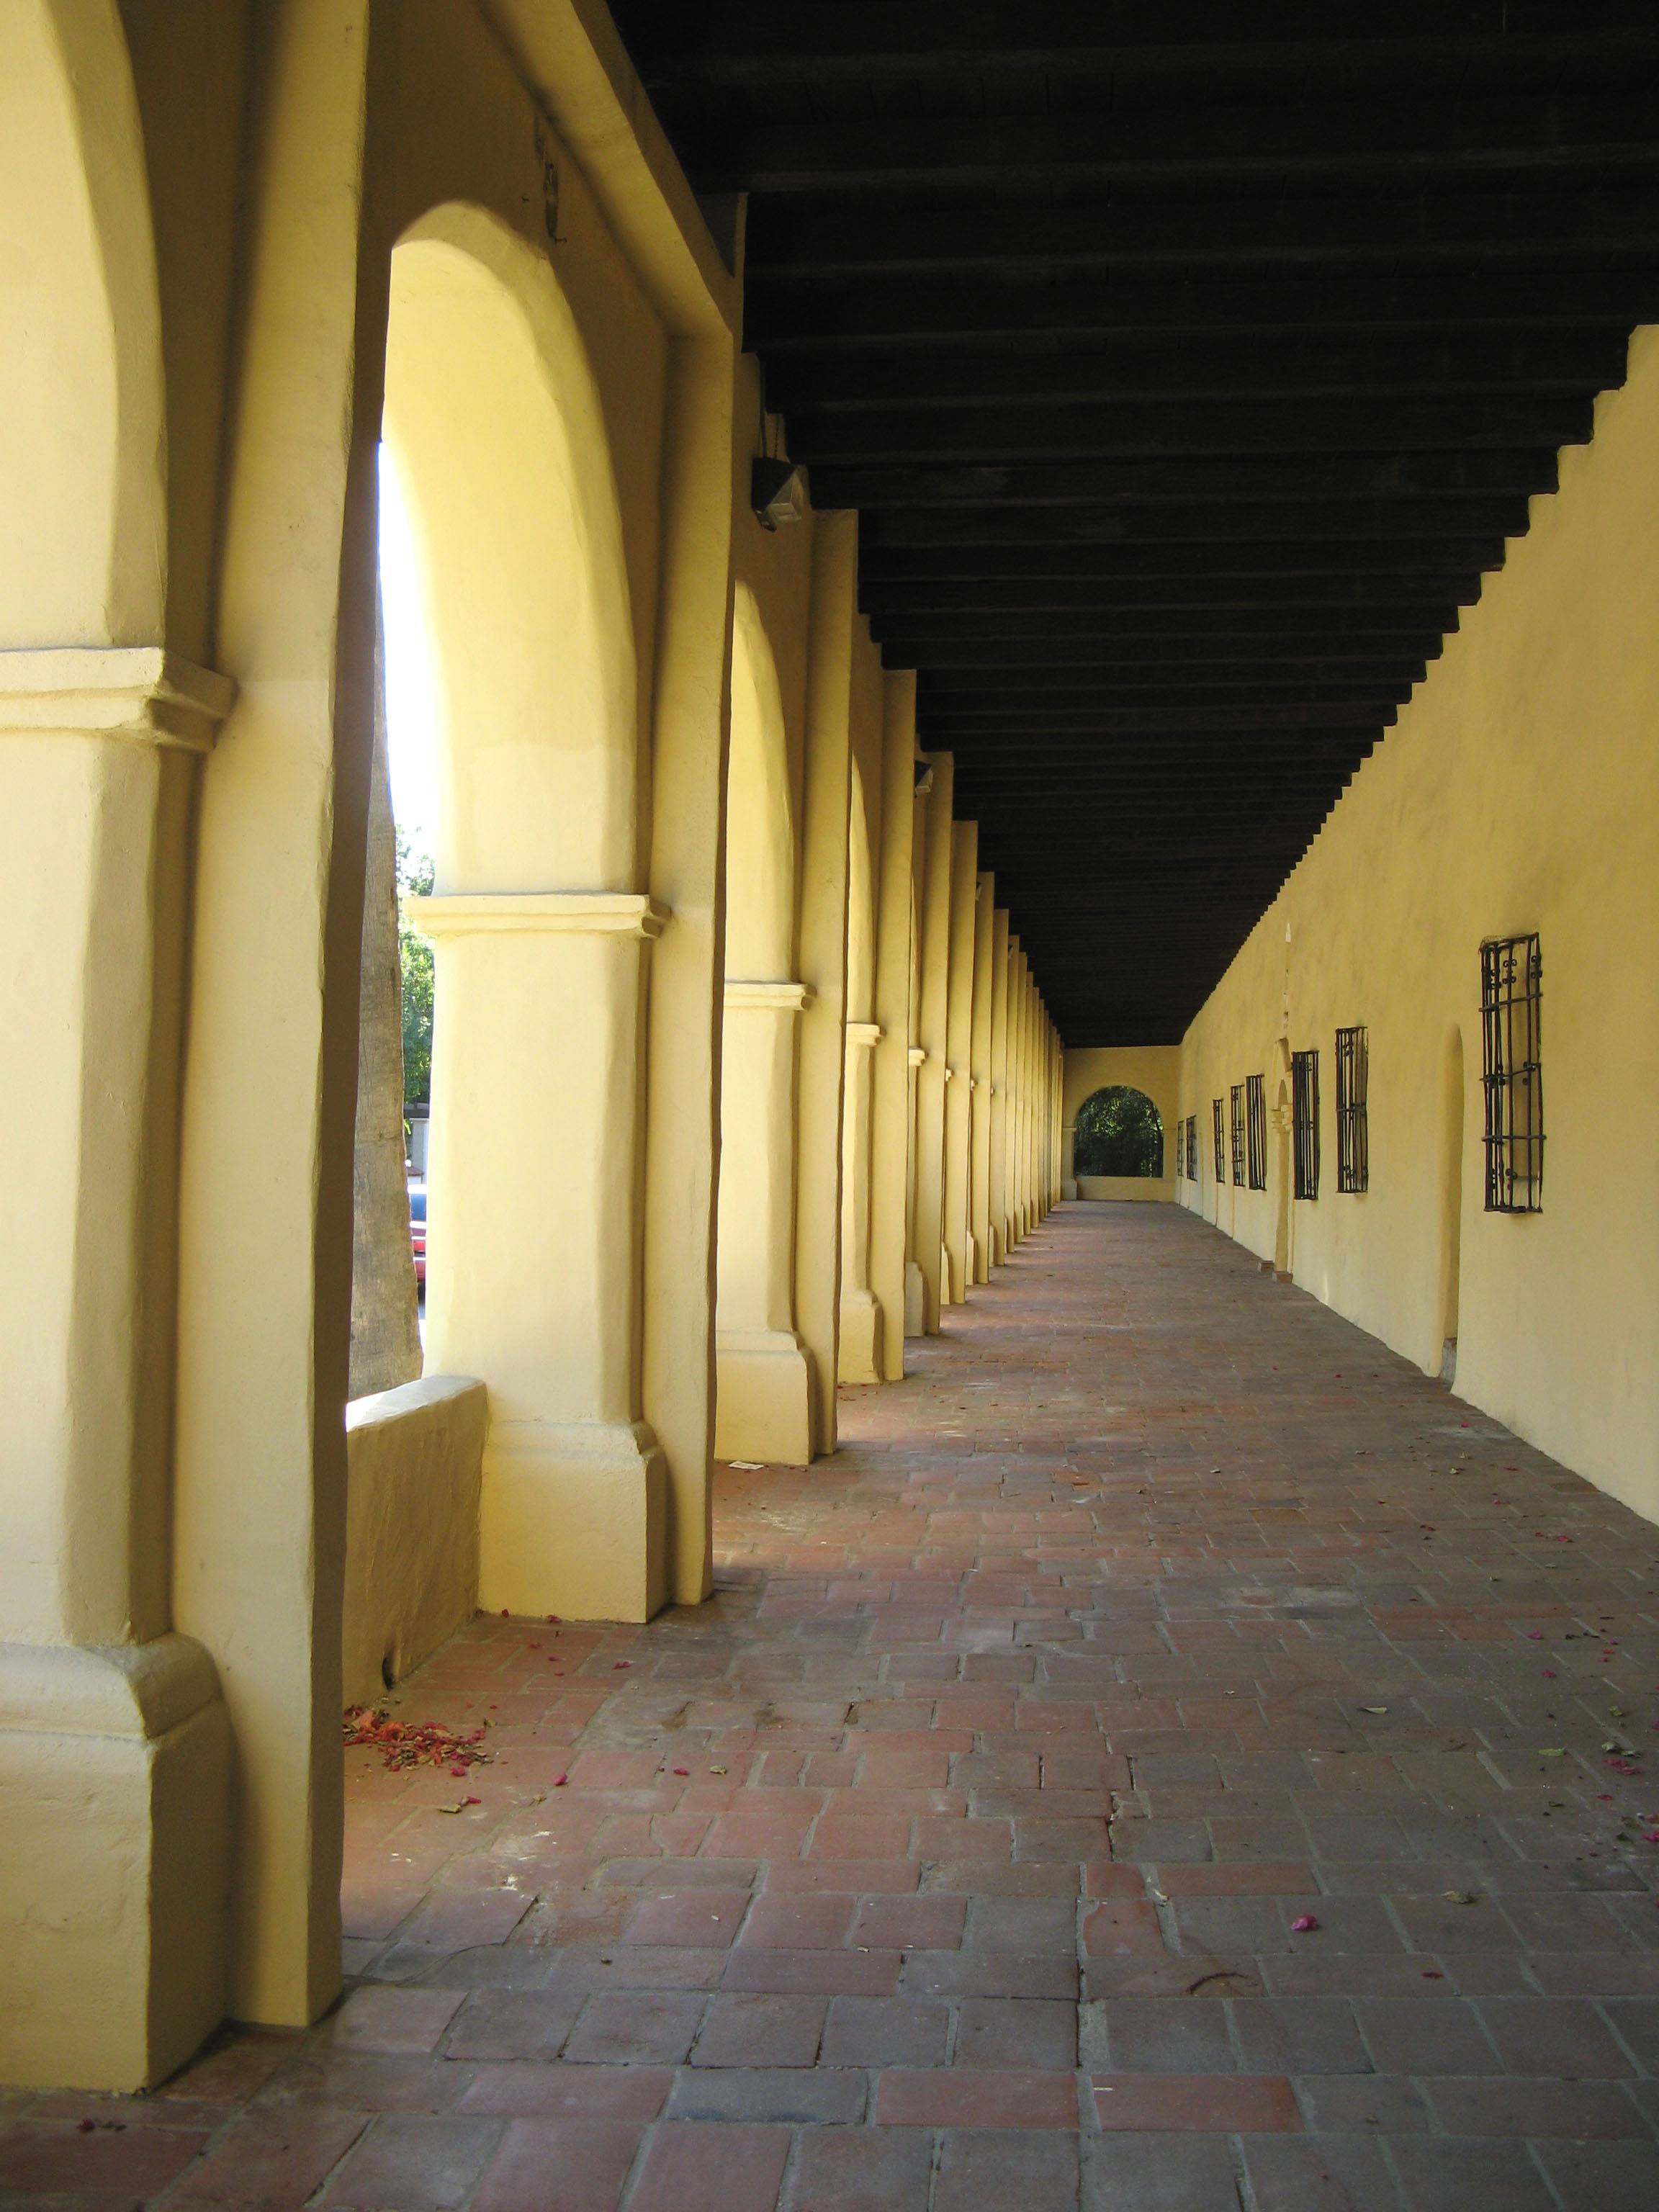 Filecorridor At Mission San Fernando Rey De Espanajpg Wikimedia